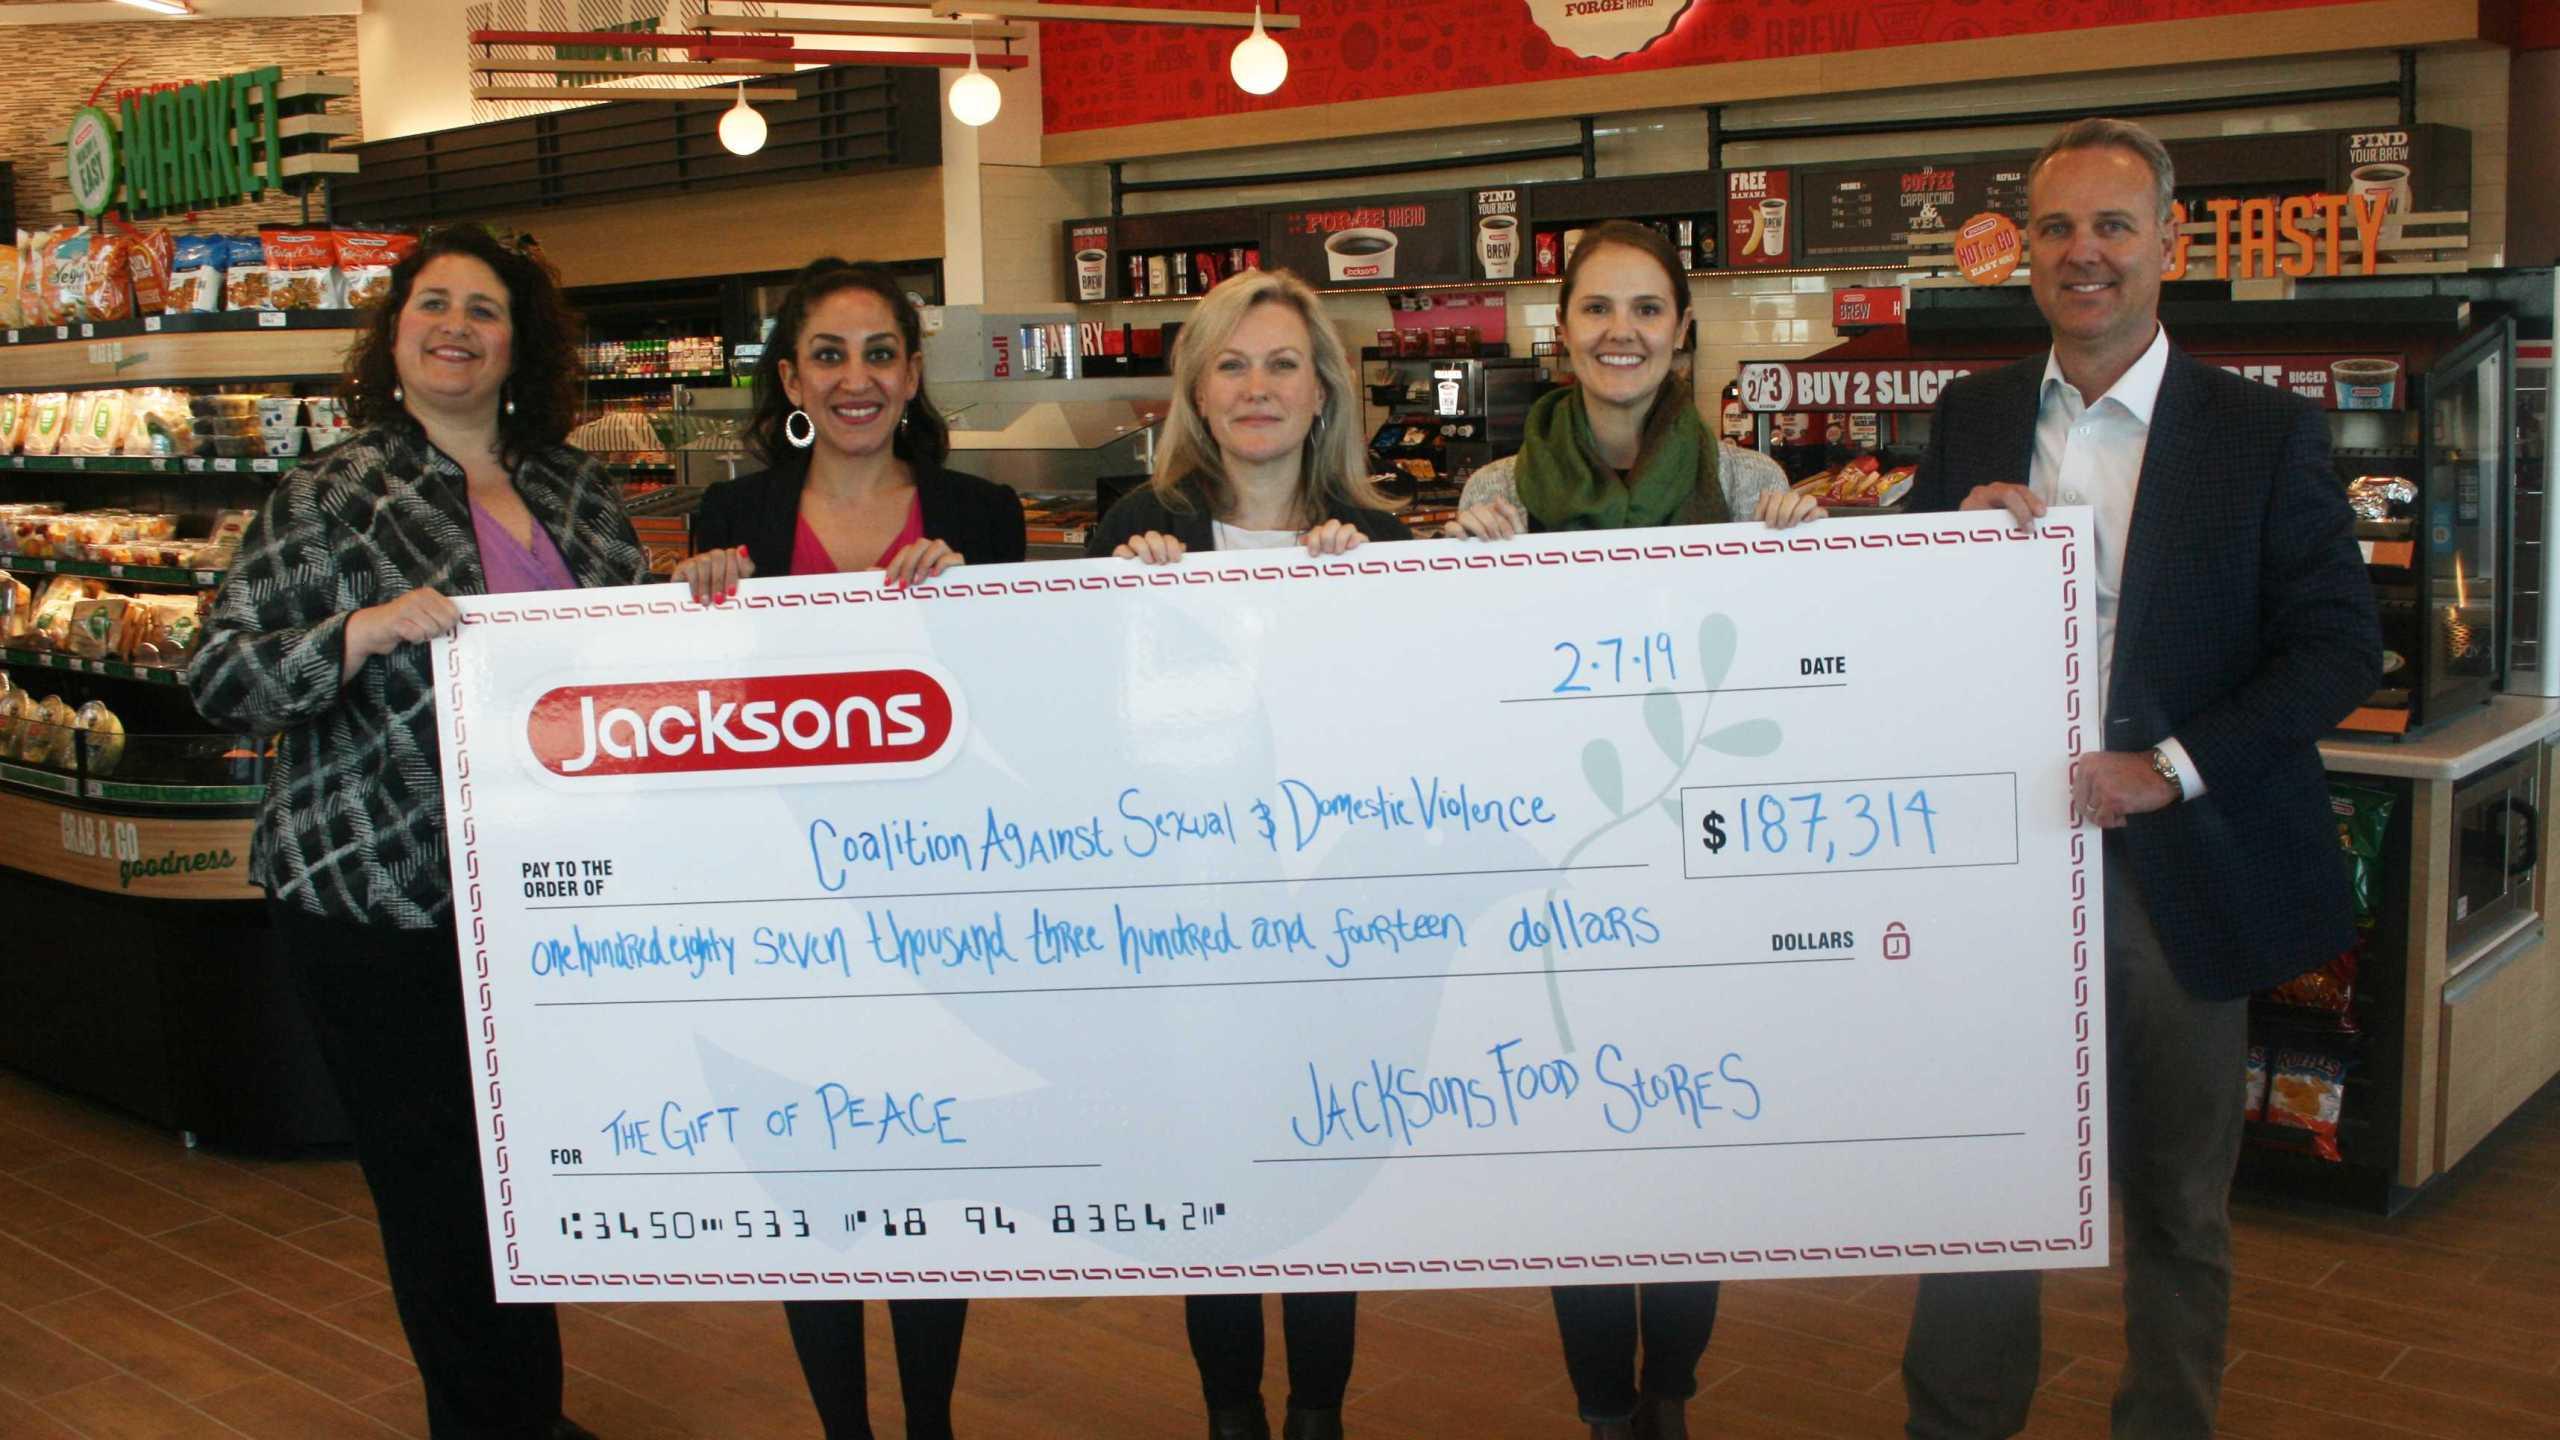 JACKSON FOOD DONATION TO CHARITY_1550524534113.jpg.jpg